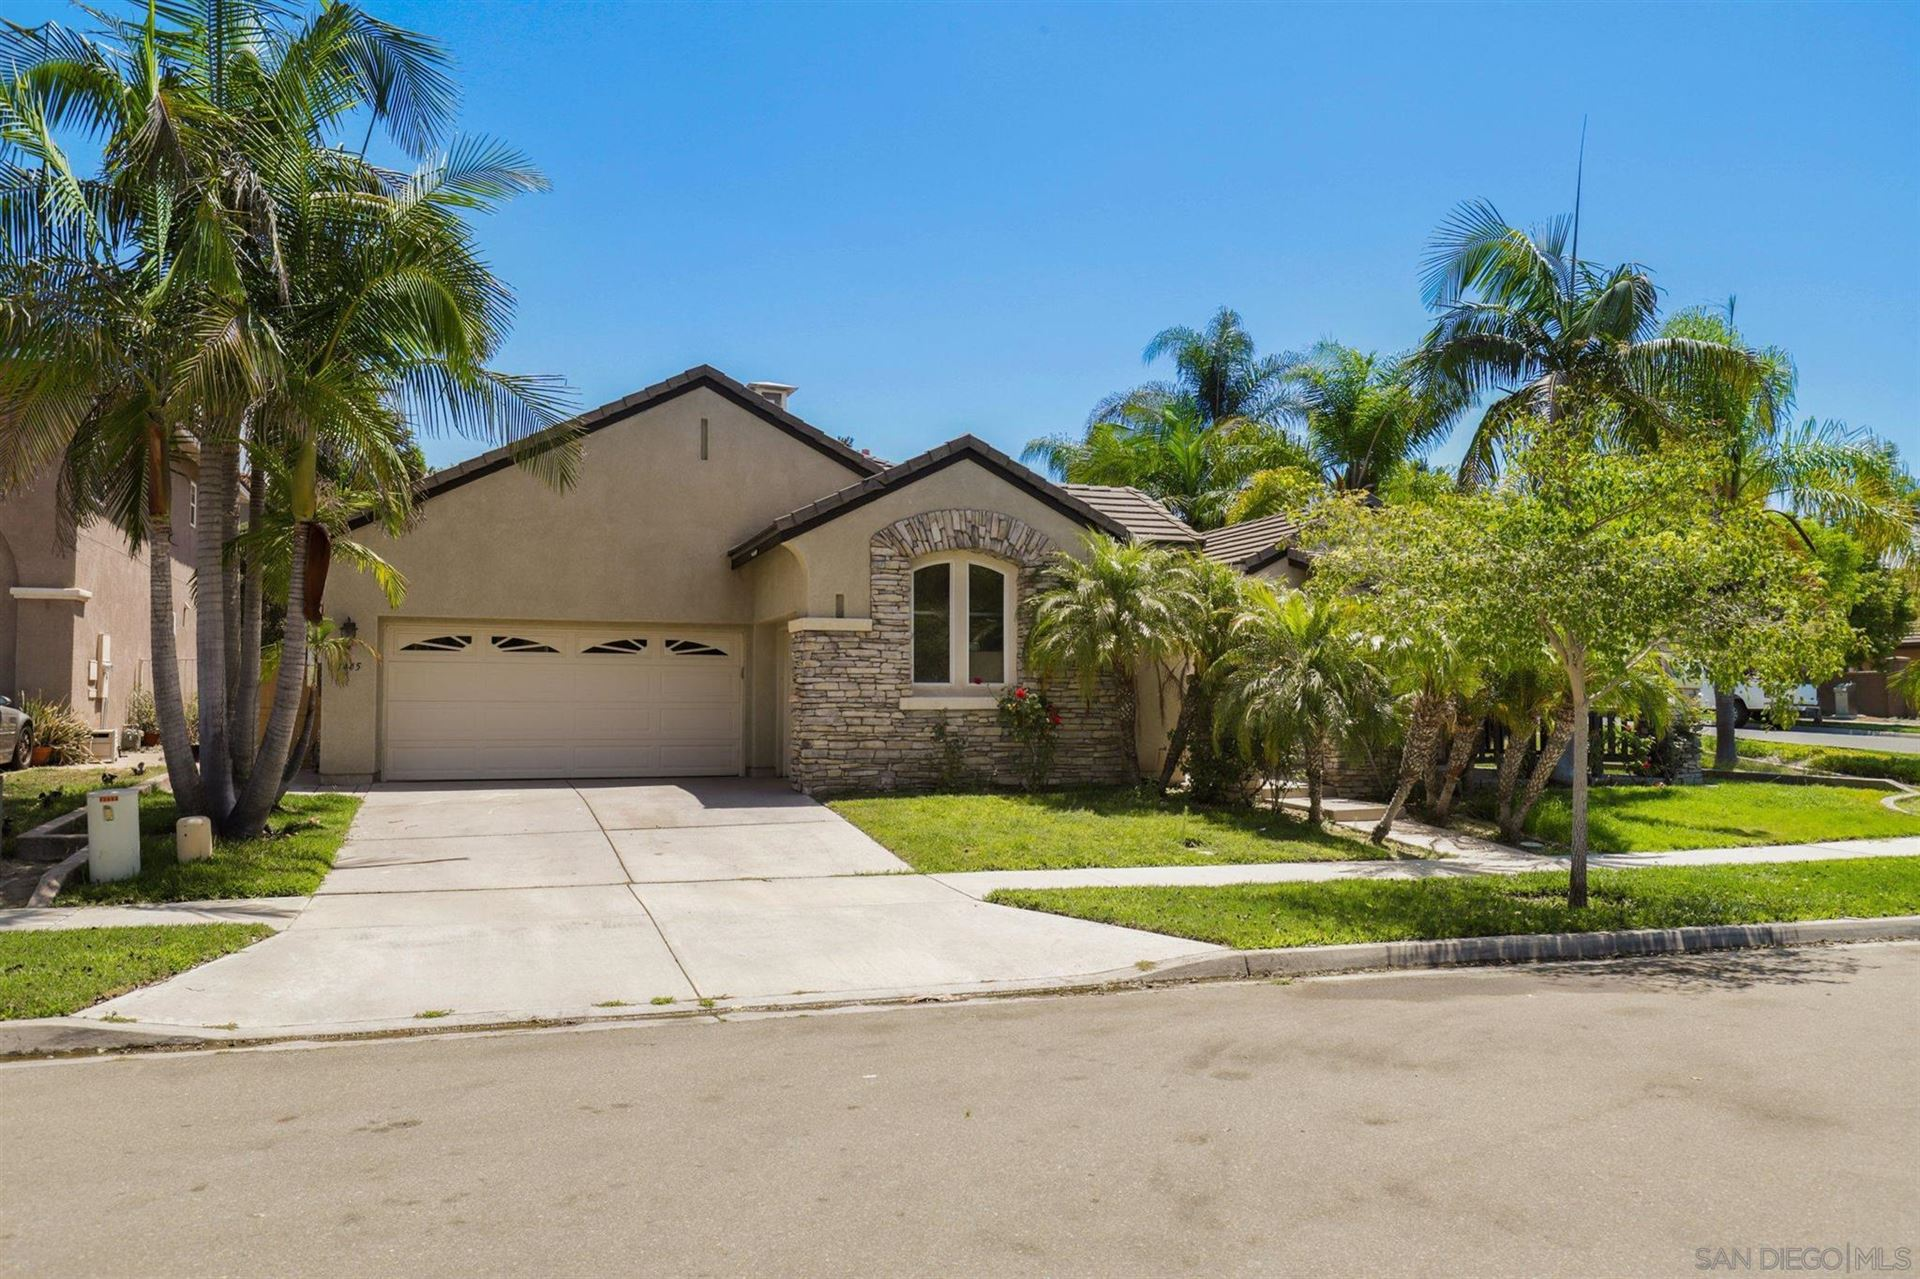 Photo of 1445 Windchime, Chula Vista, CA 91913 (MLS # 210021373)